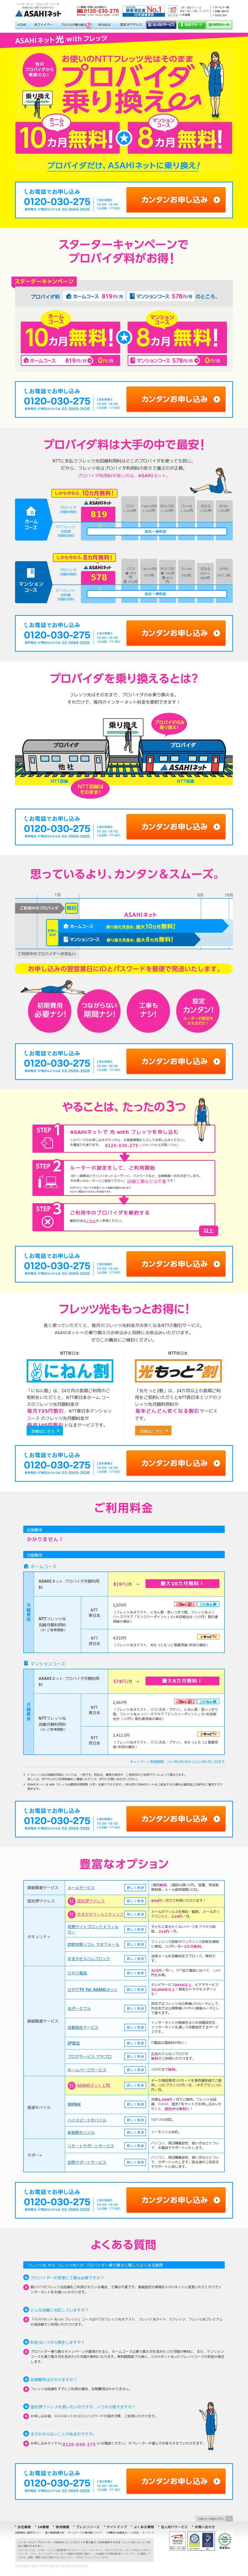 Website 'http://asahi-net.jp/service/norikae/' snapped on Snapito!